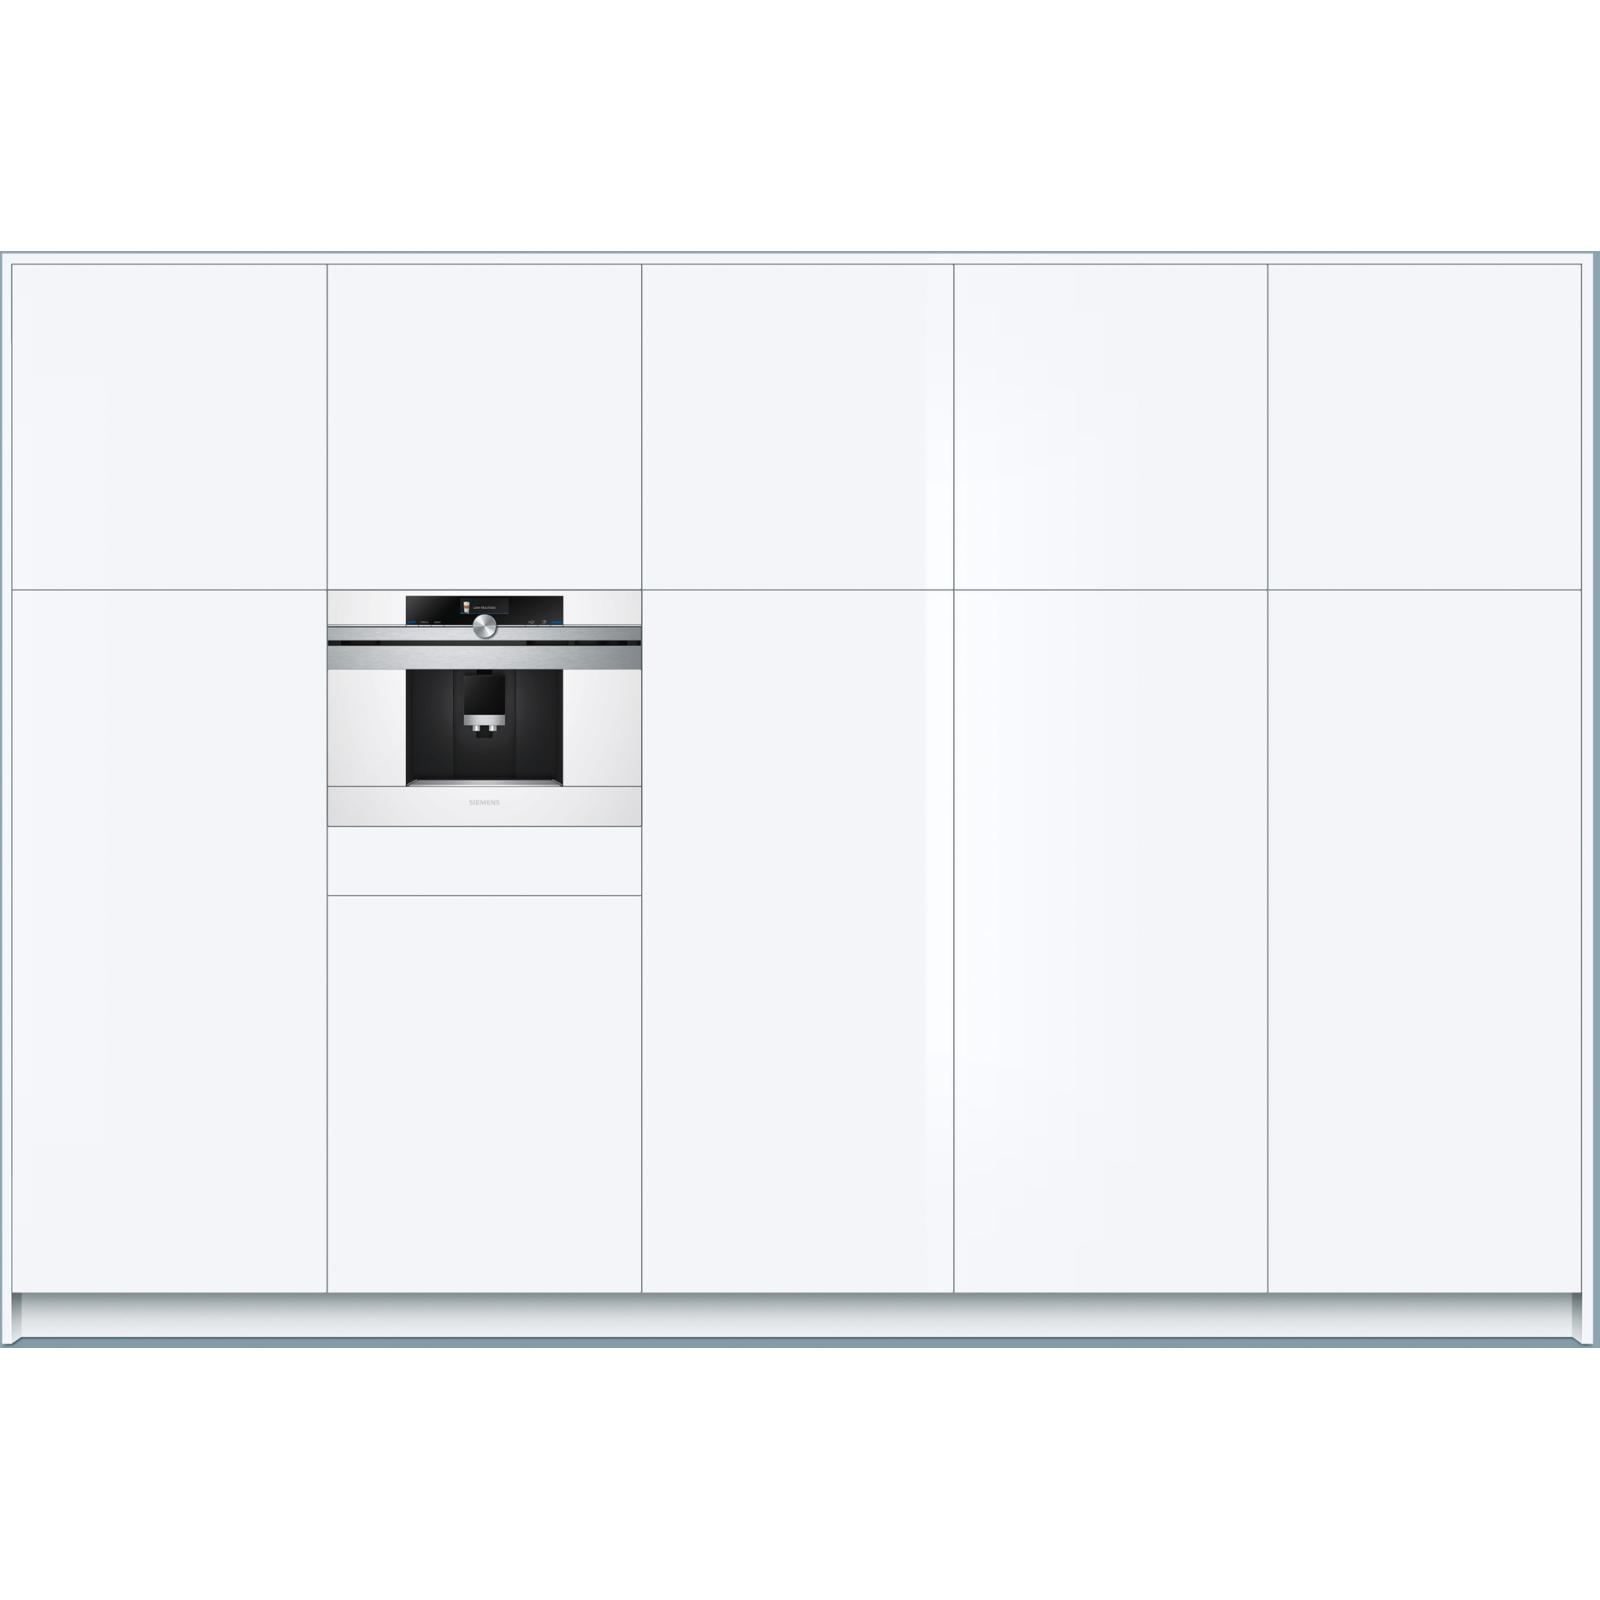 Кофеварка Siemens CT 636 LEW1 (CT636LEW1) изображение 4